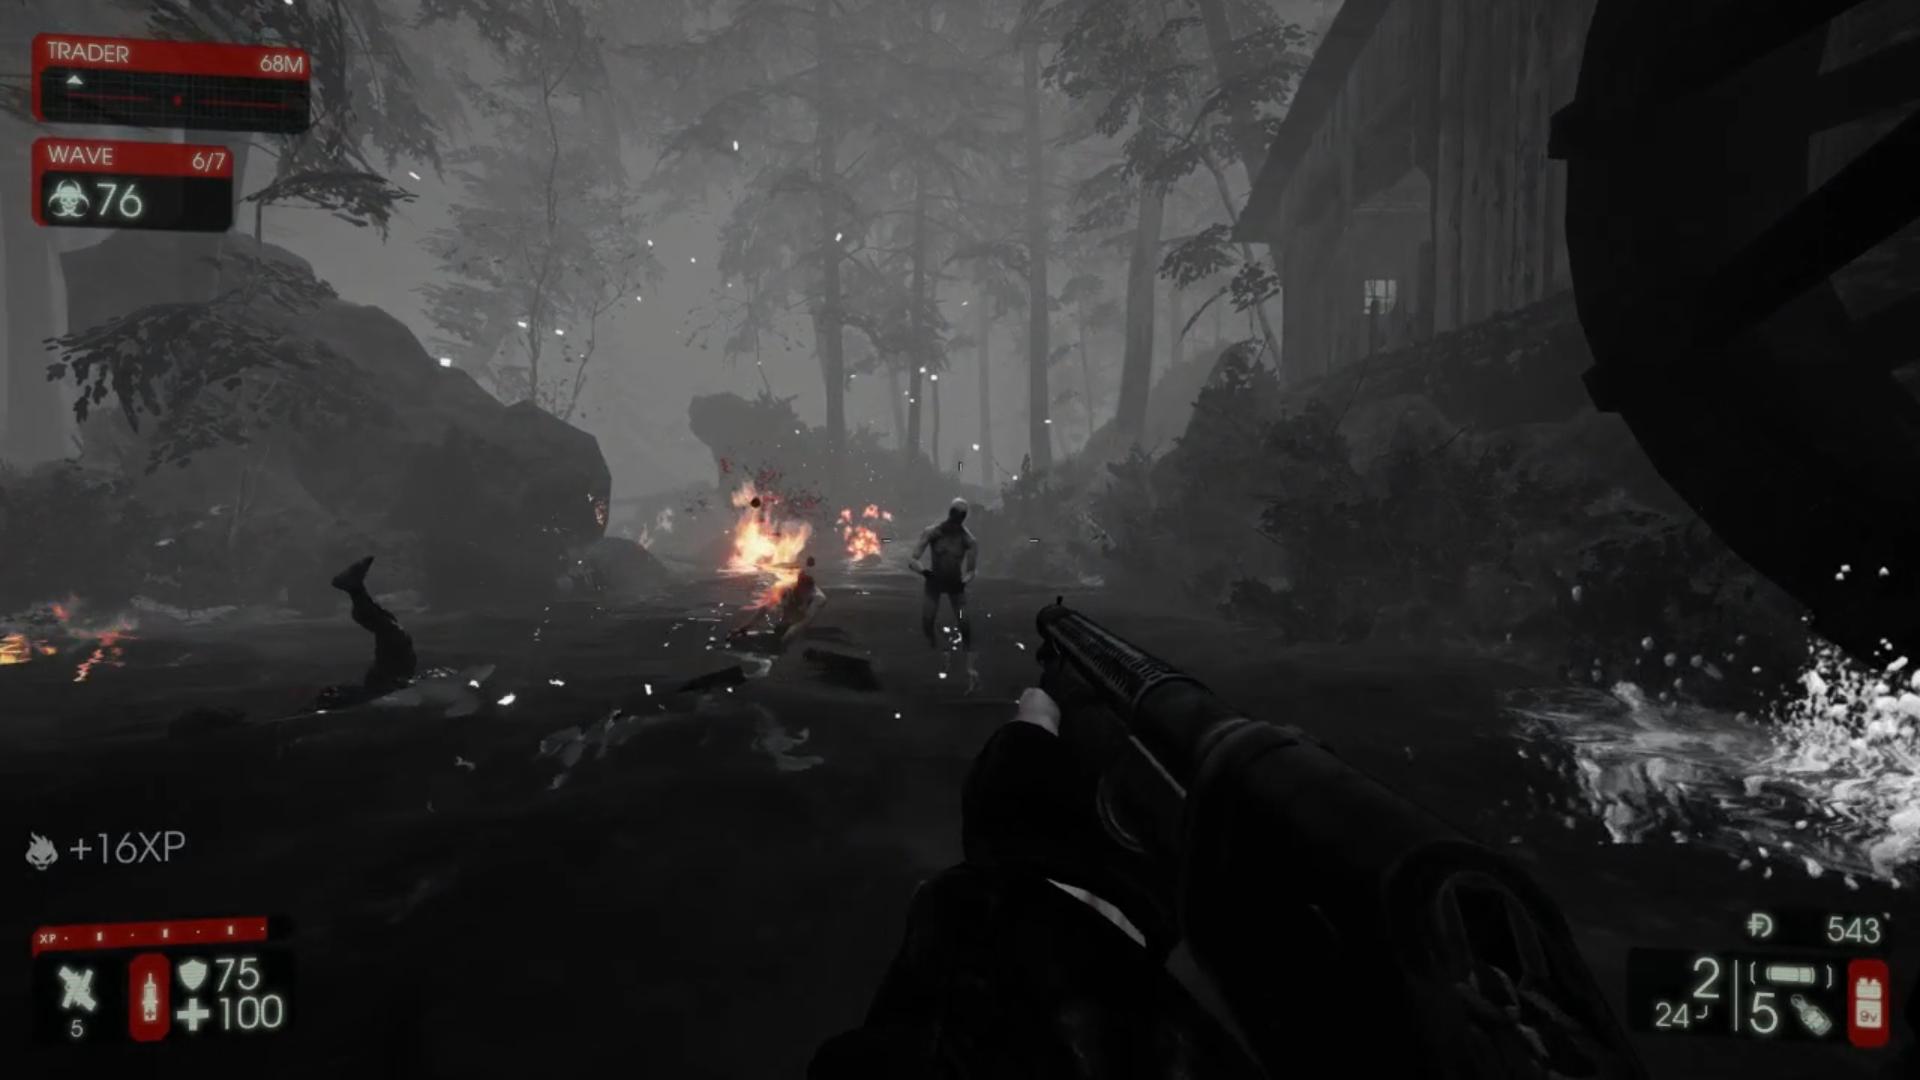 Three Promising Early Access Games: Killing Floor 2, Epsilon